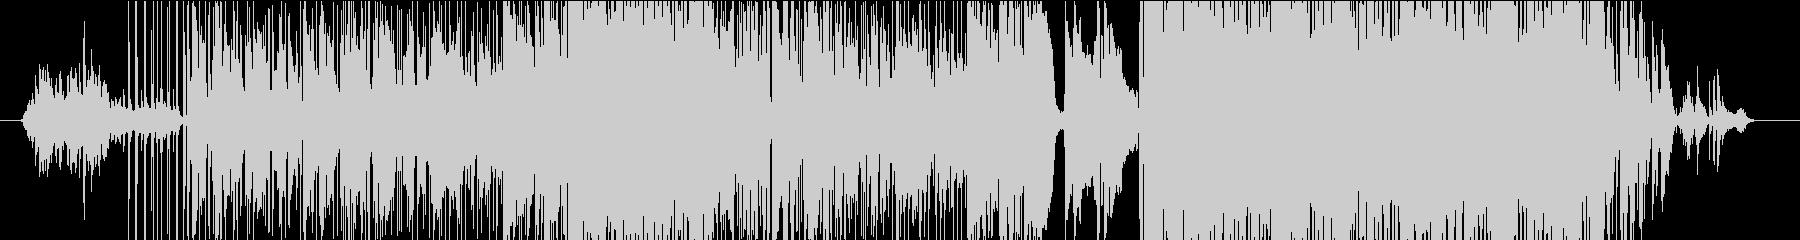 C-POPでポップな曲の未再生の波形